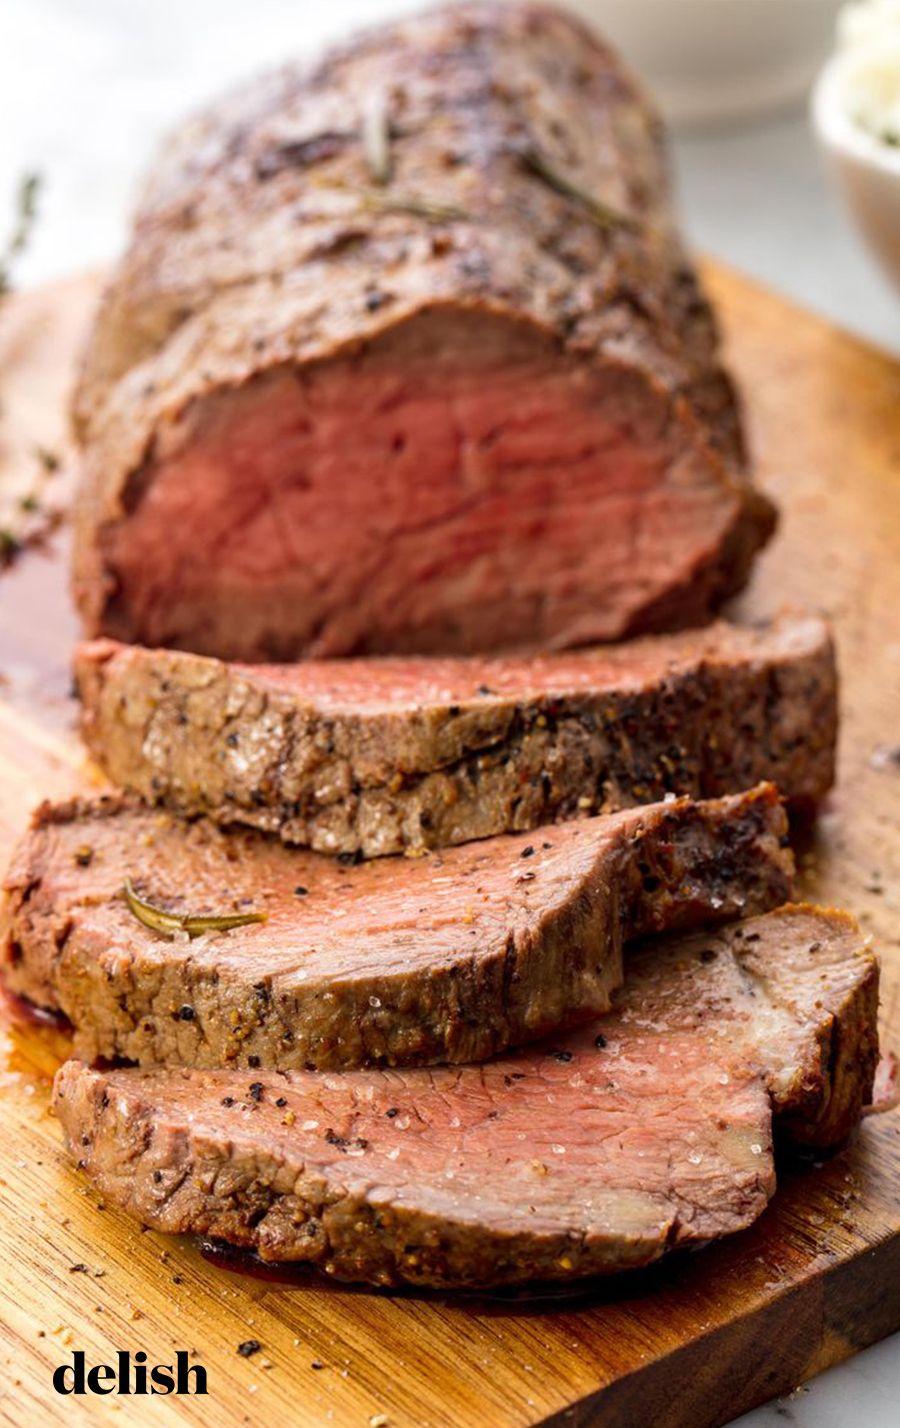 Beef Tenderloin The Easiest Most Impressive Holiday Dinner Ever Recipe Best Roast Beef Best Beef Tenderloin Recipe Beef Tenderloin Recipes